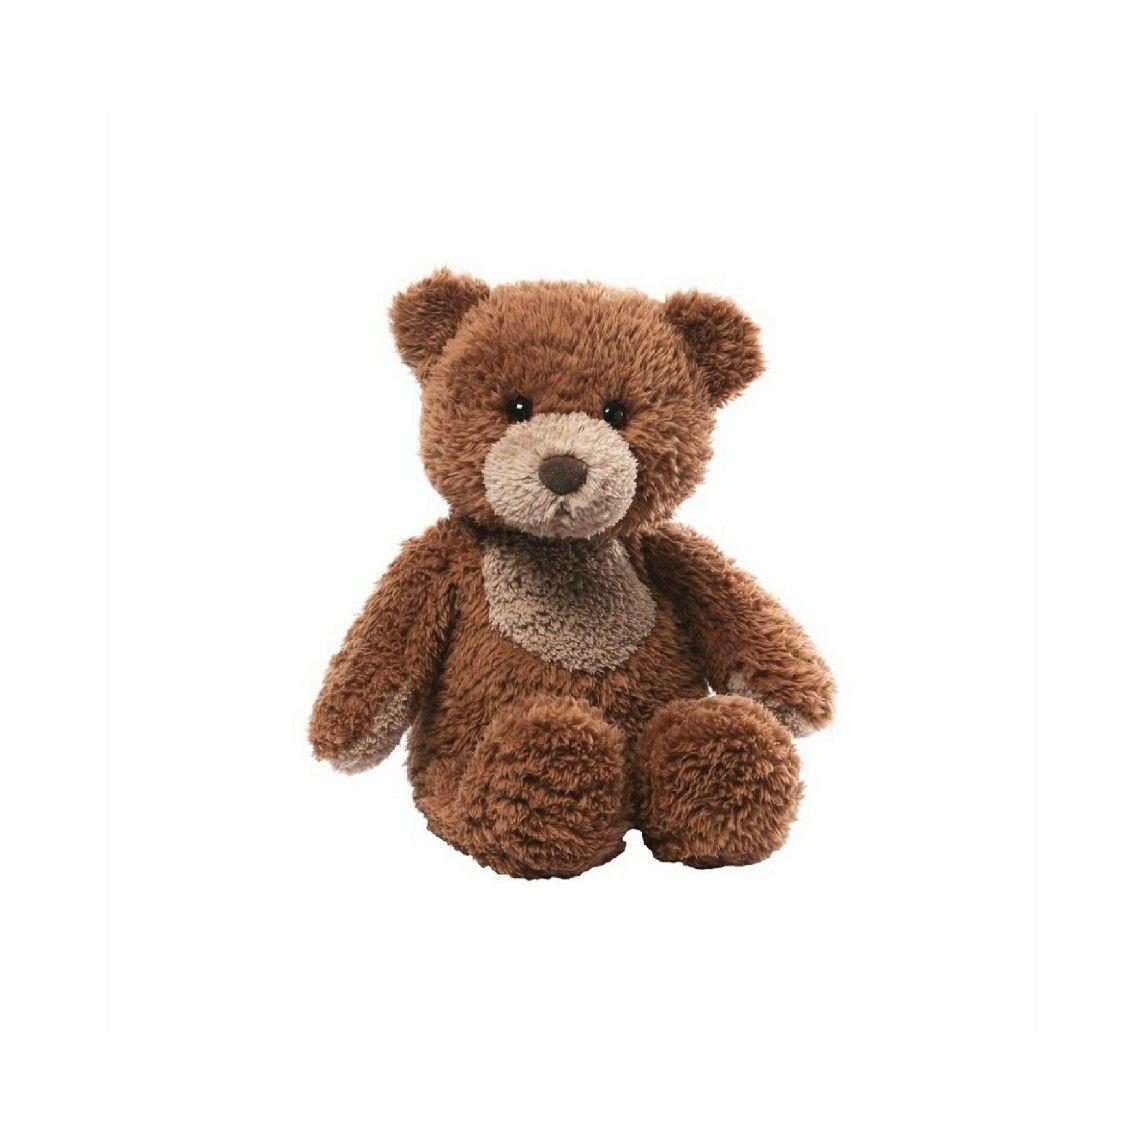 Pin By Eliza Wachulec On Crybaby Bear Stuffed Animal Teddy Bear Stuffed Animal Monkey Stuffed Animal [ 1144 x 1144 Pixel ]